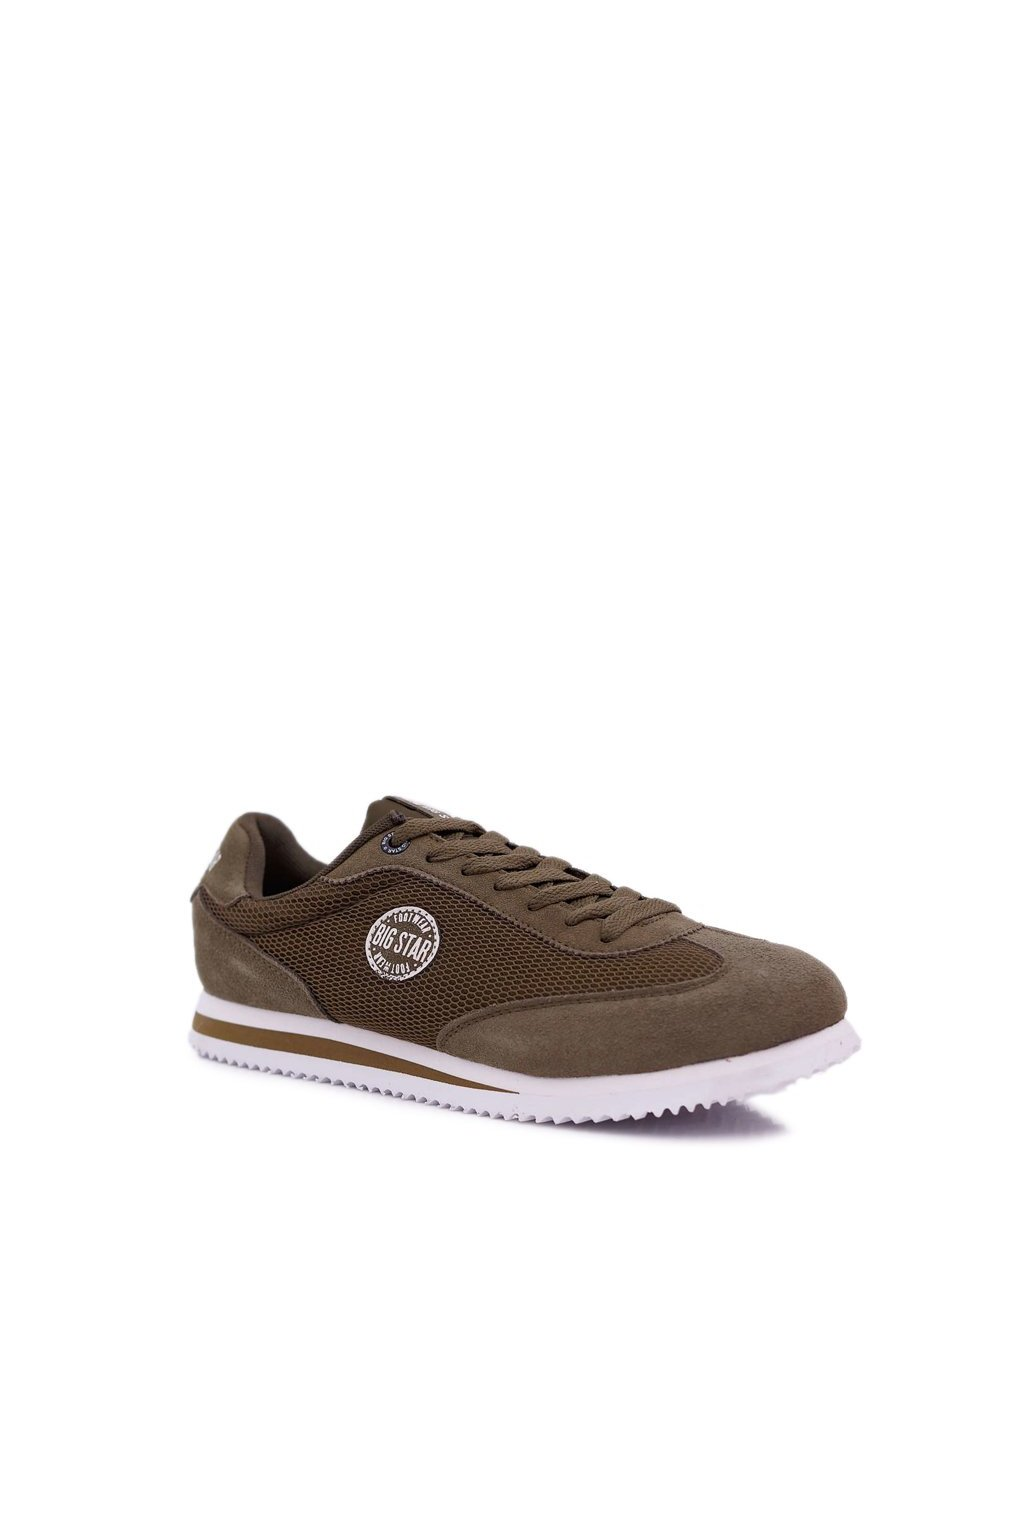 Zelená obuv kód topánok DD174088 KHAKI